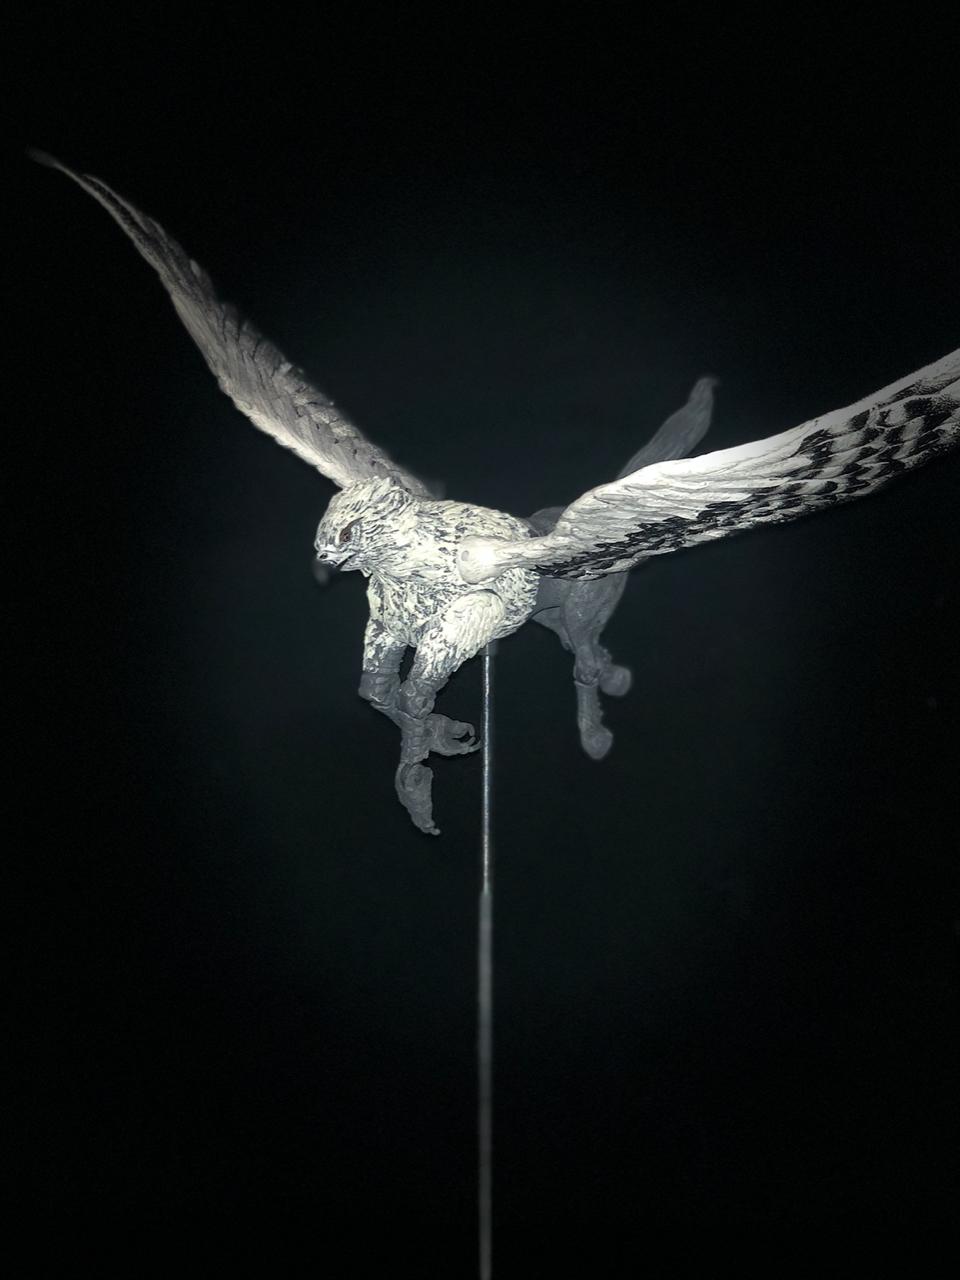 Buckbeak in flight